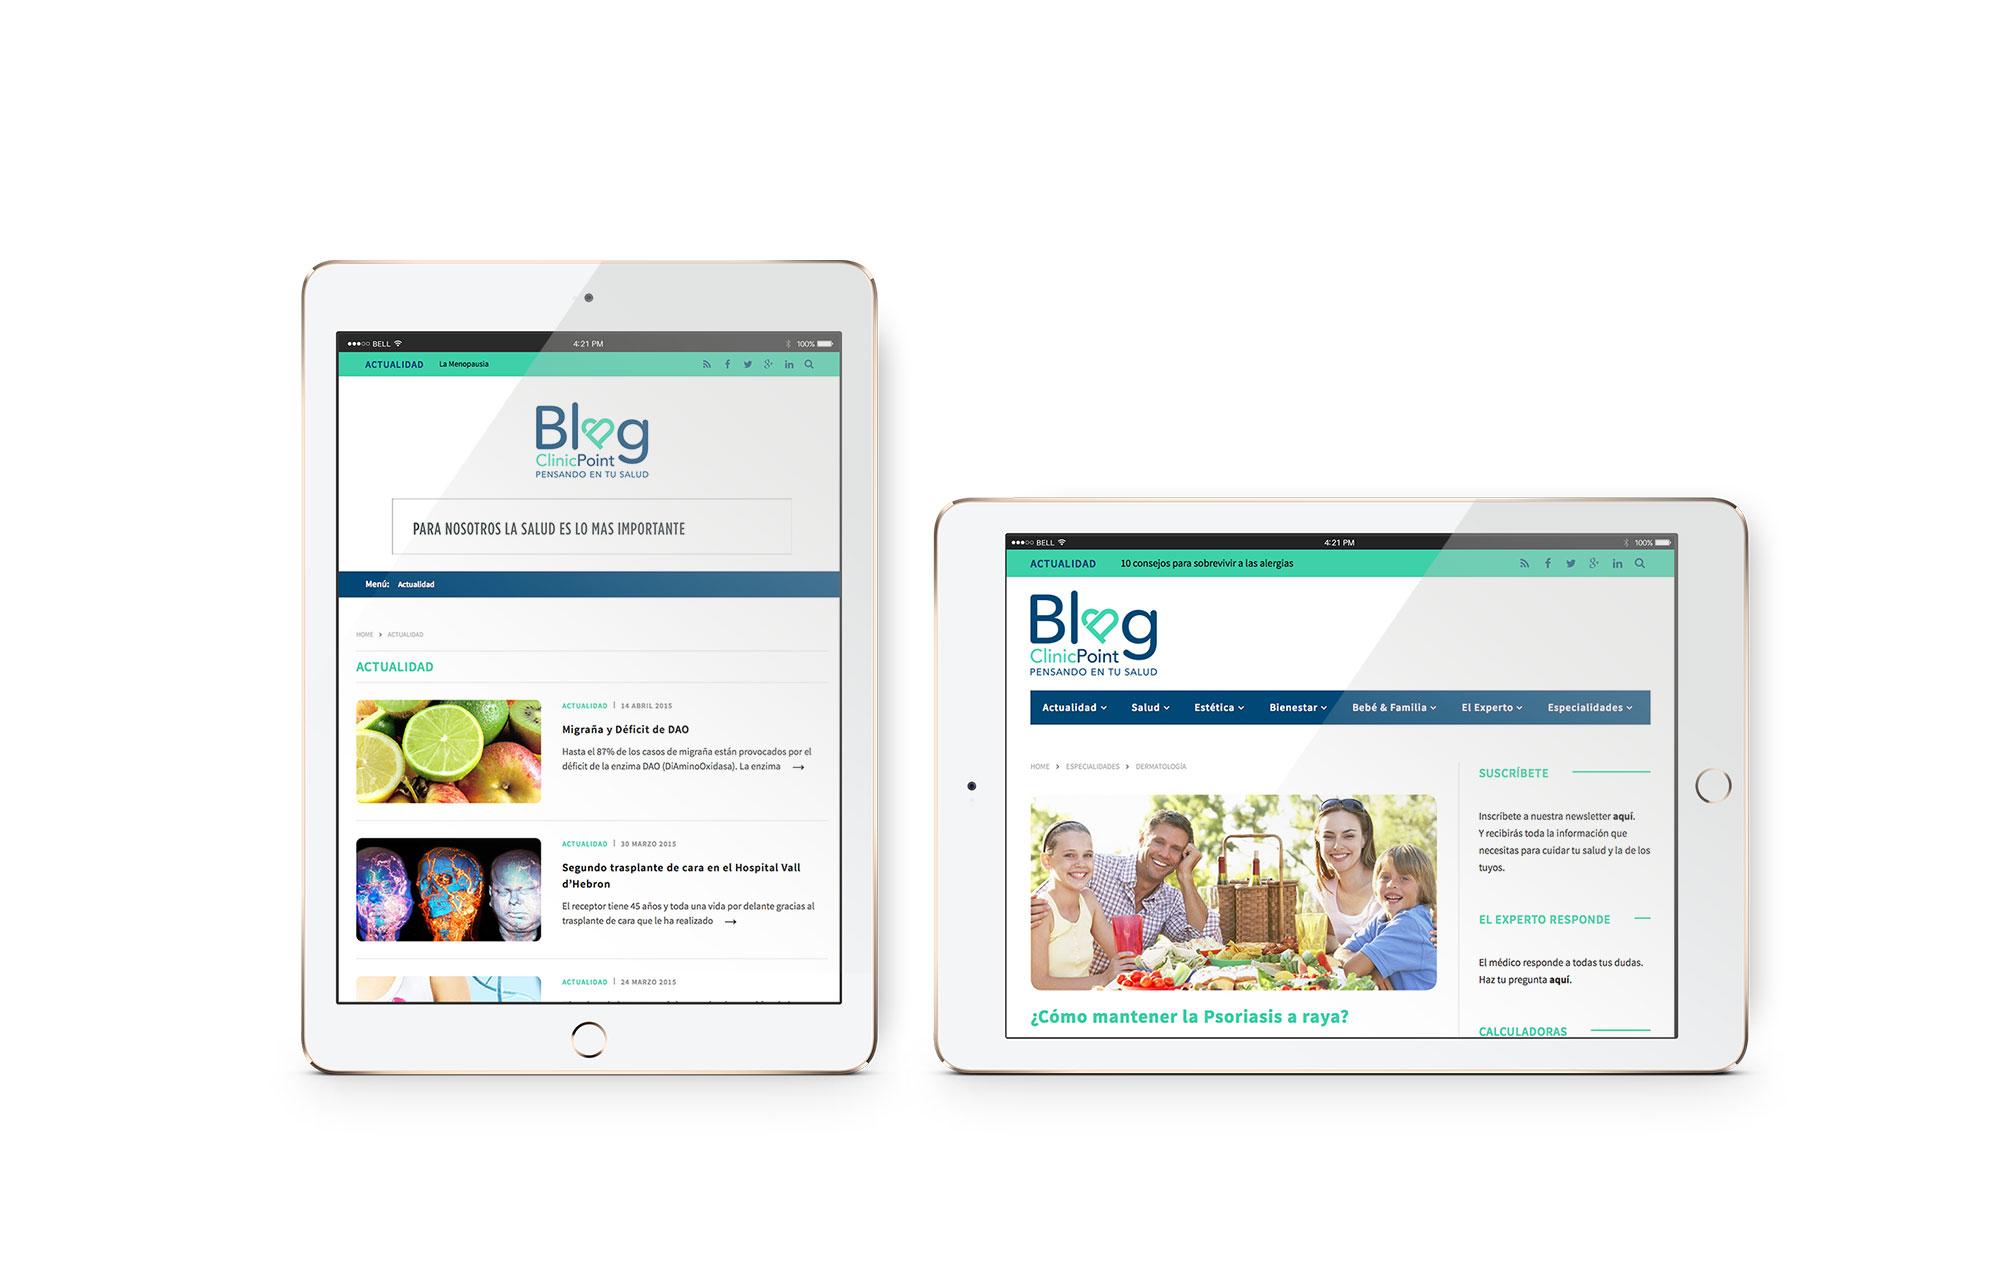 MEDPRIVE-BLOG-iPad-2.jpg